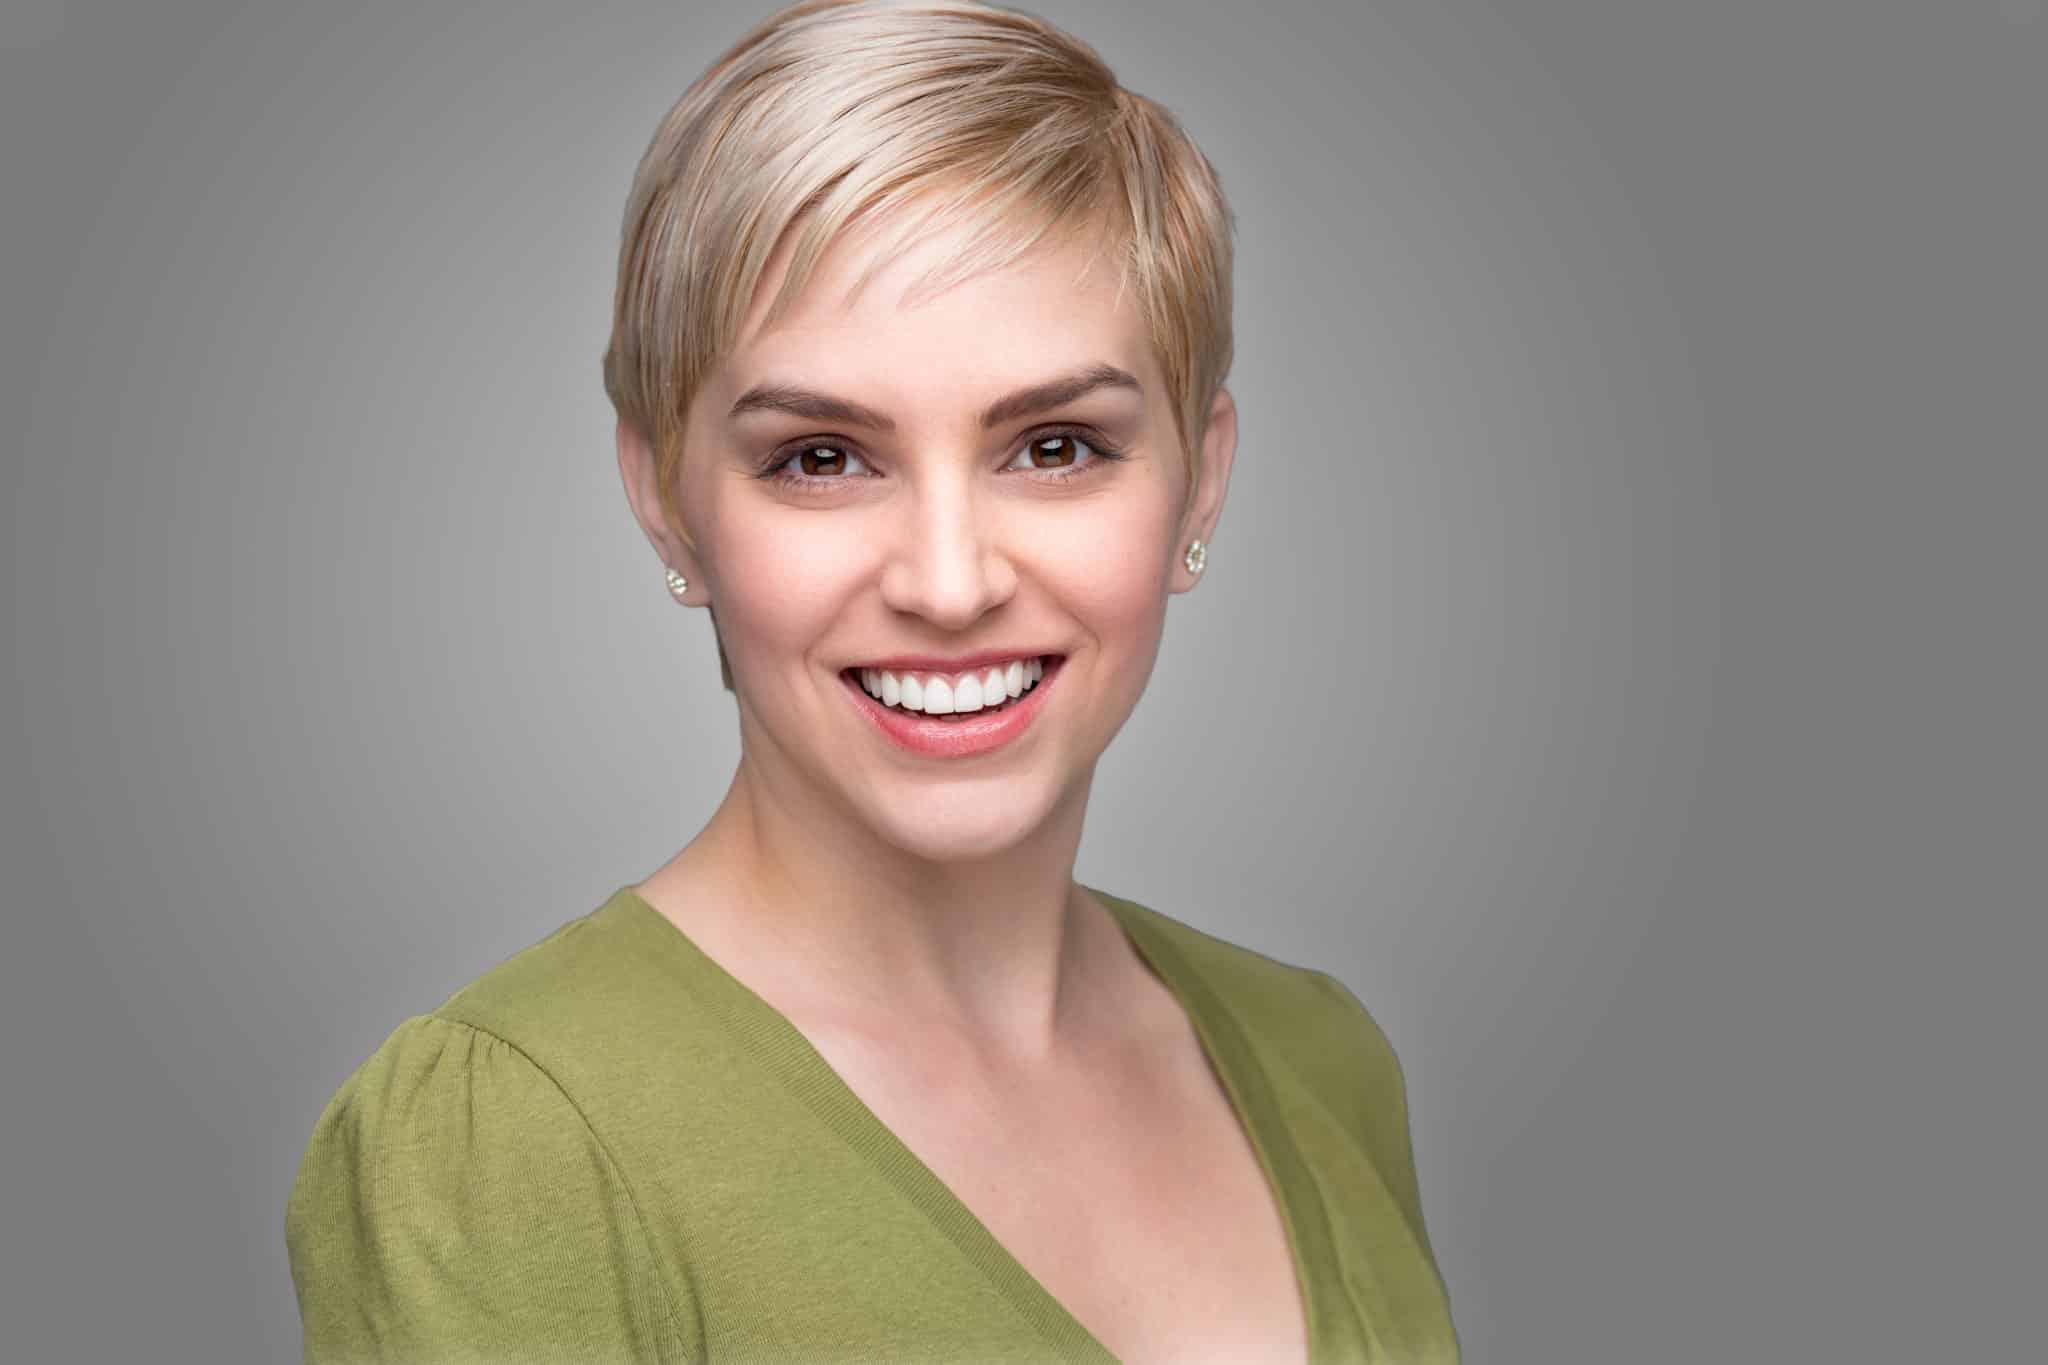 Dental Veneers: A New Smile in Just A Few Visits